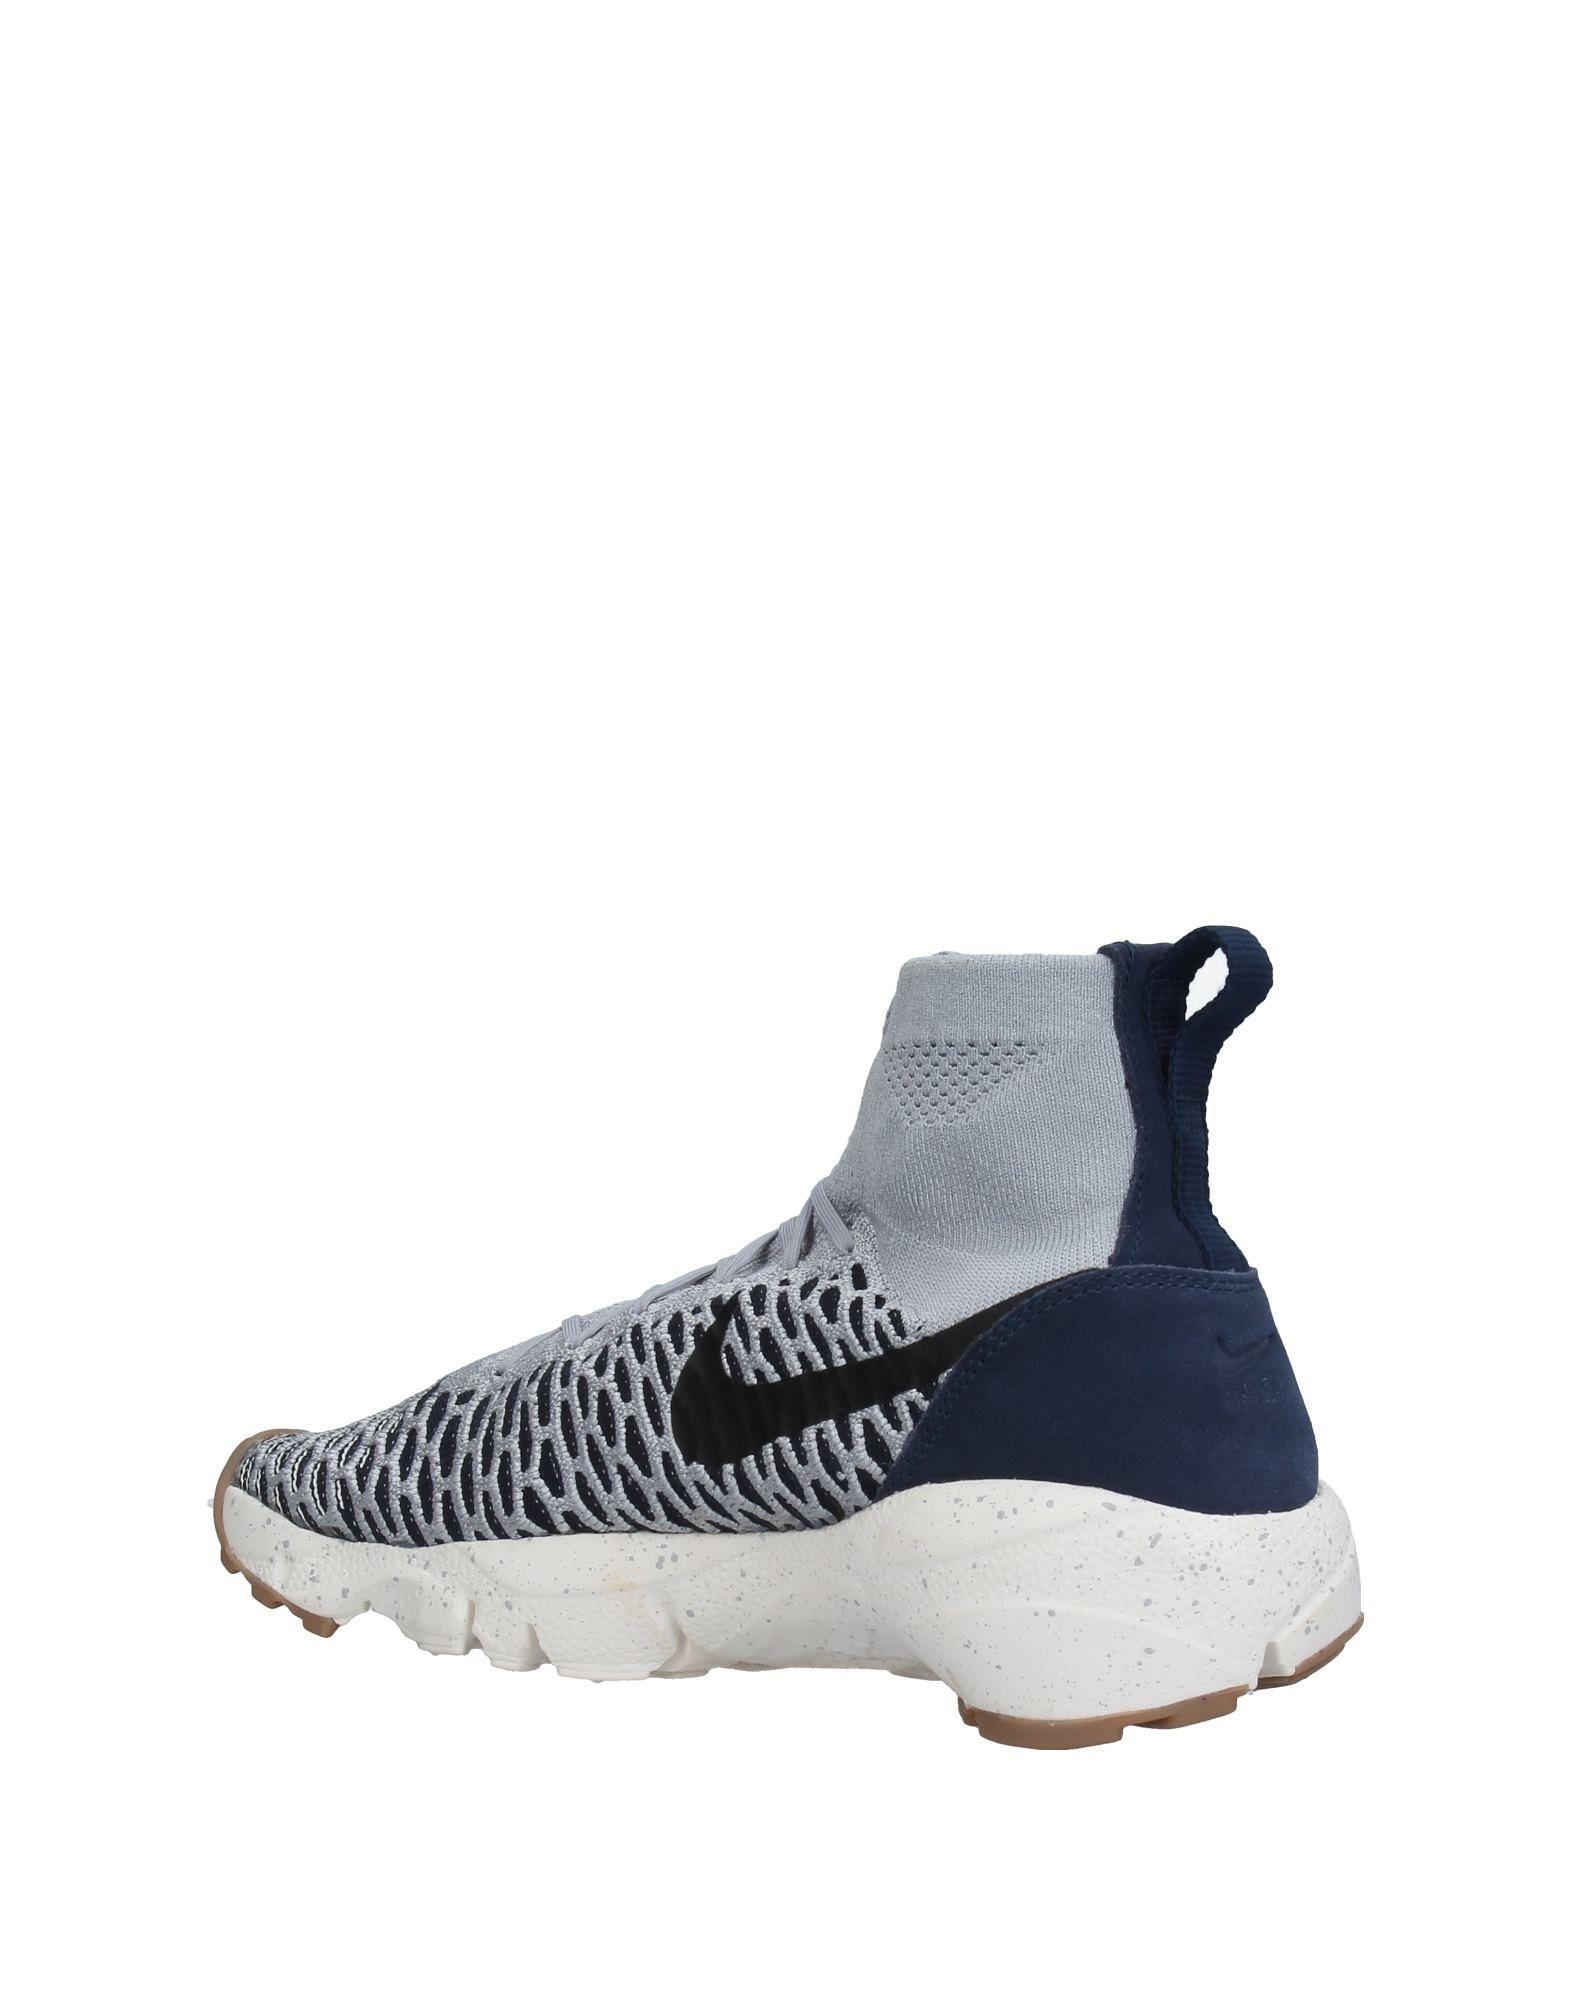 nike hightops amp sneakers in gray for men lyst